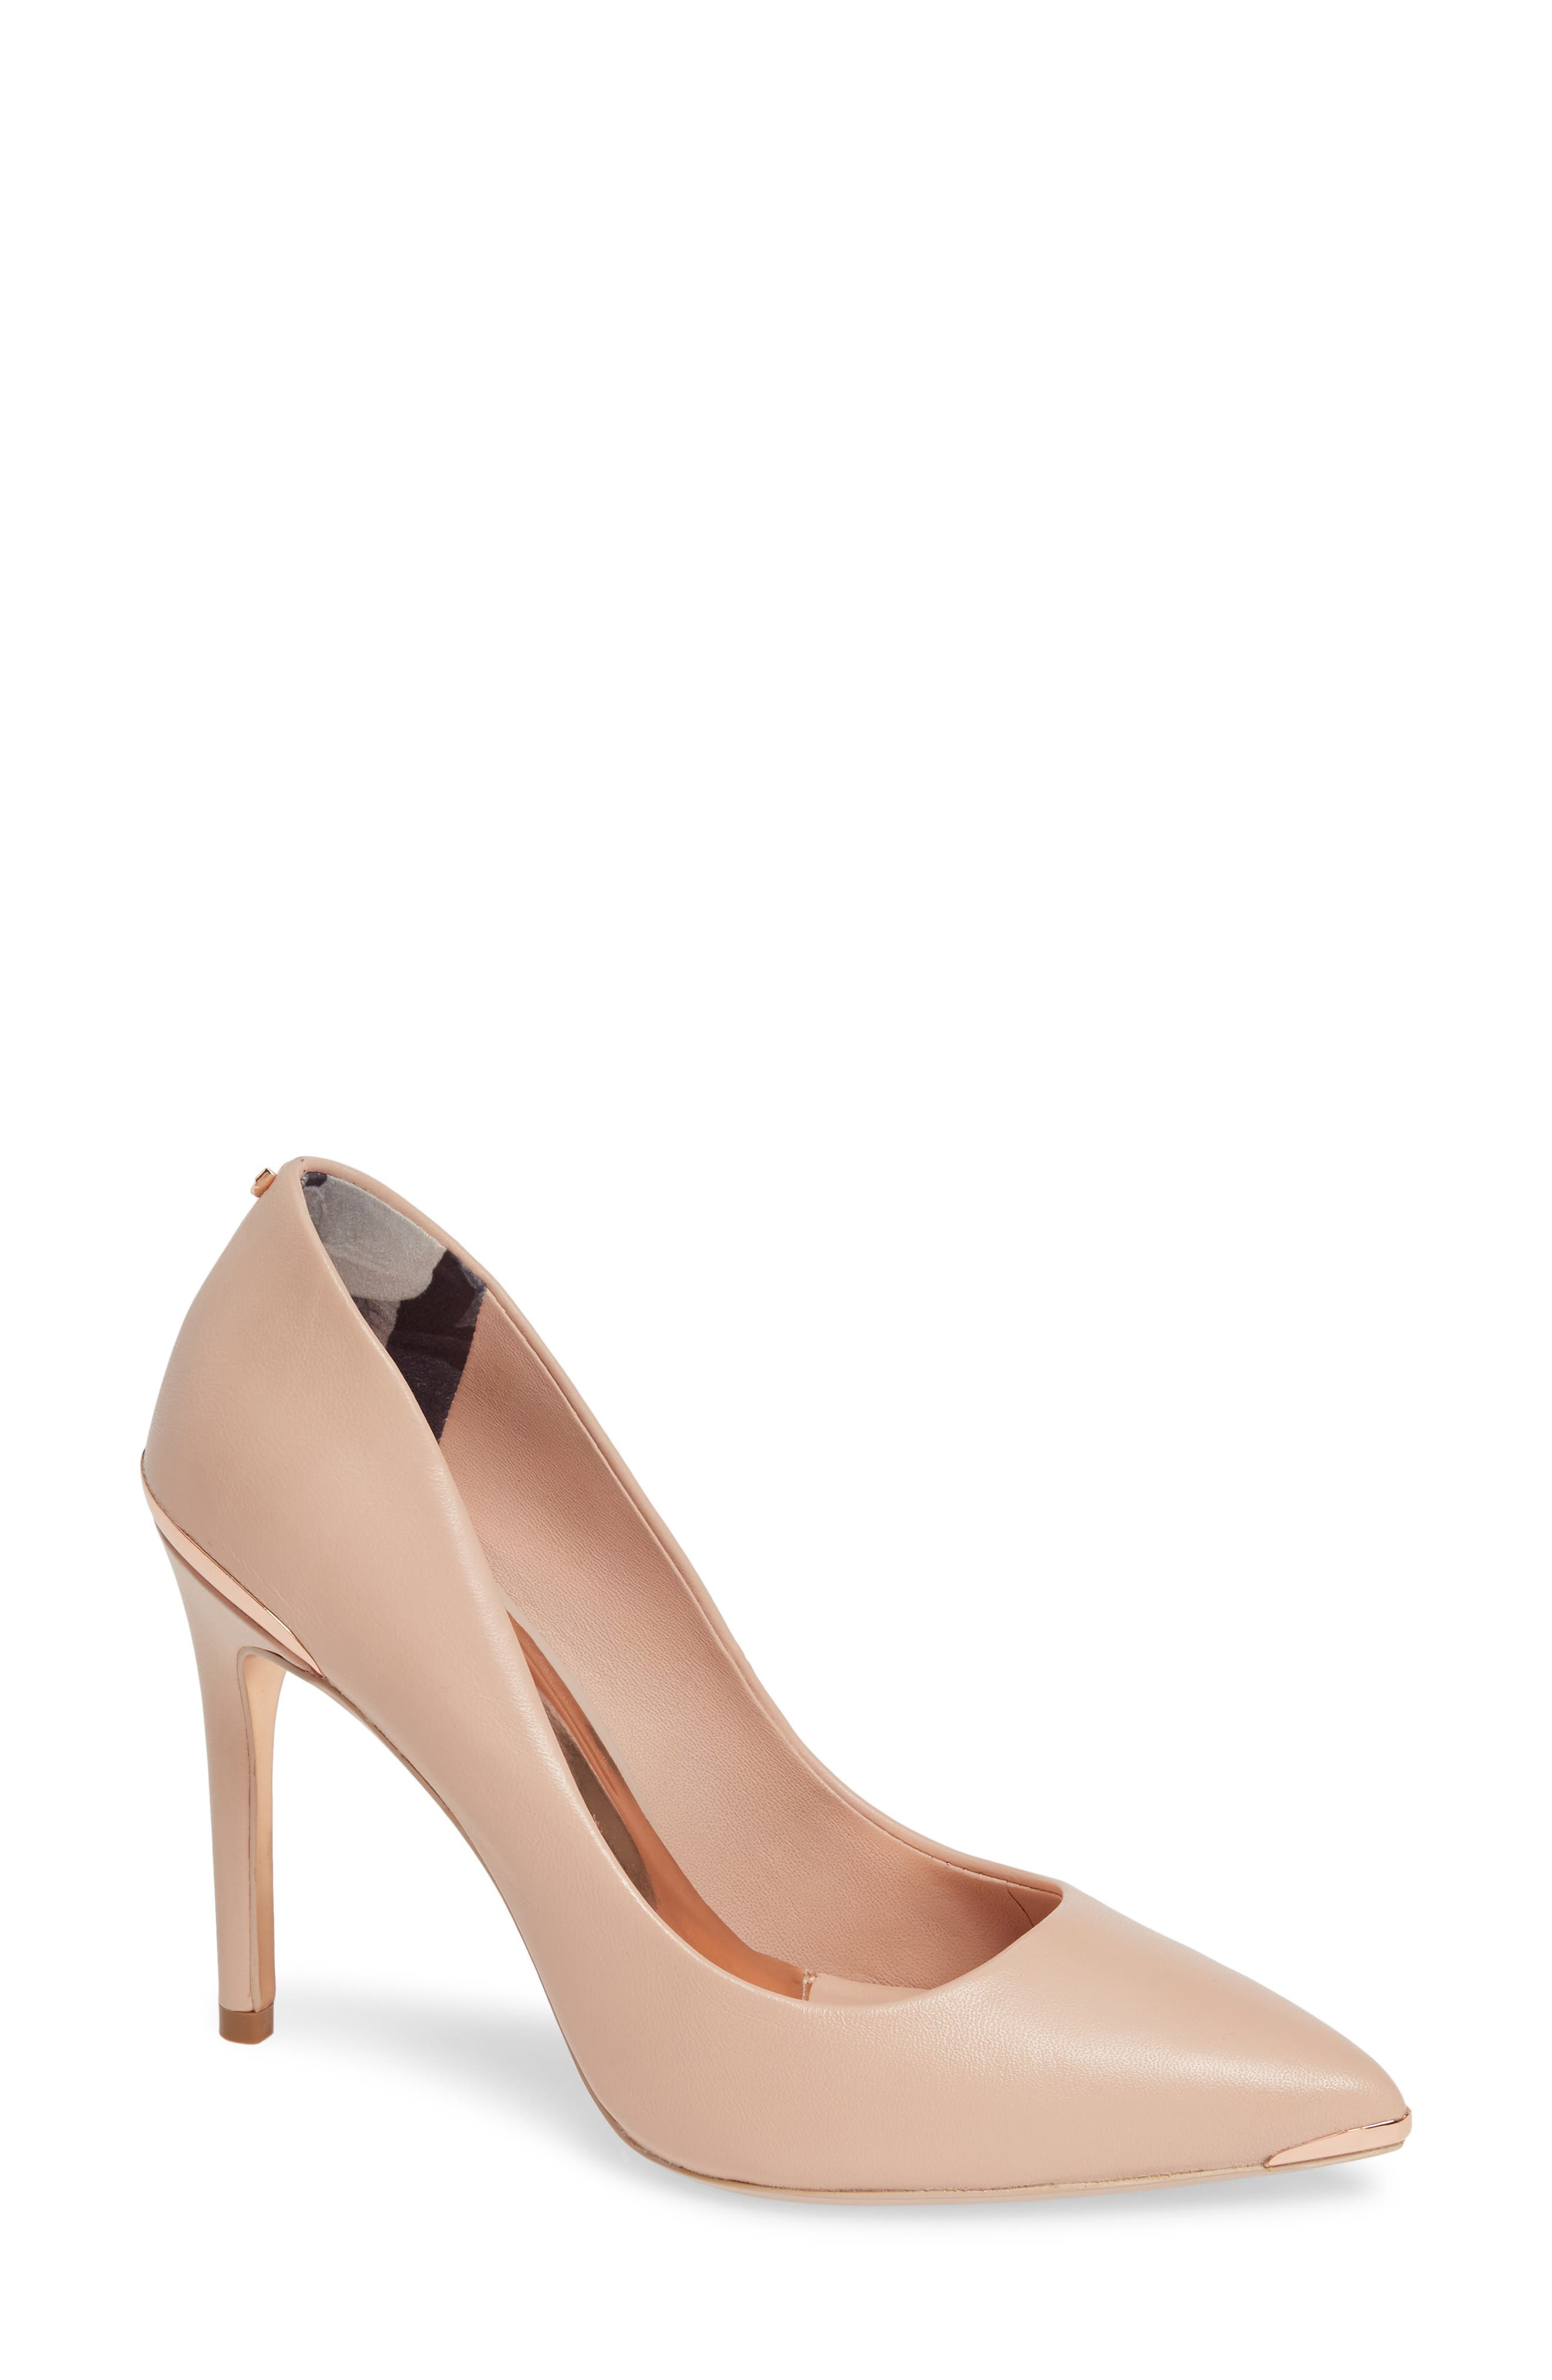 Women's Ted Baker London Shoes | Nordstrom